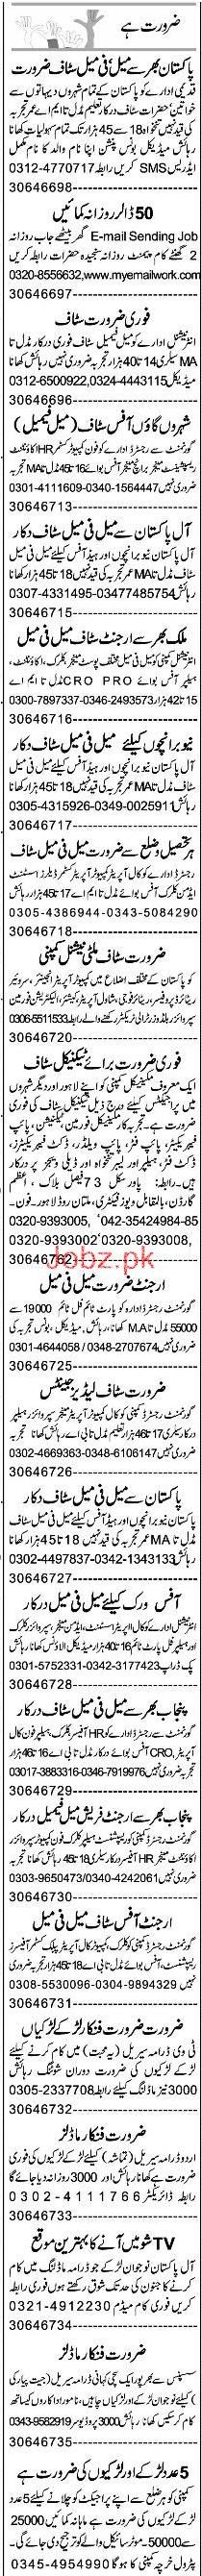 Mechannical Foreman, Technicians, Fabricators Wanted